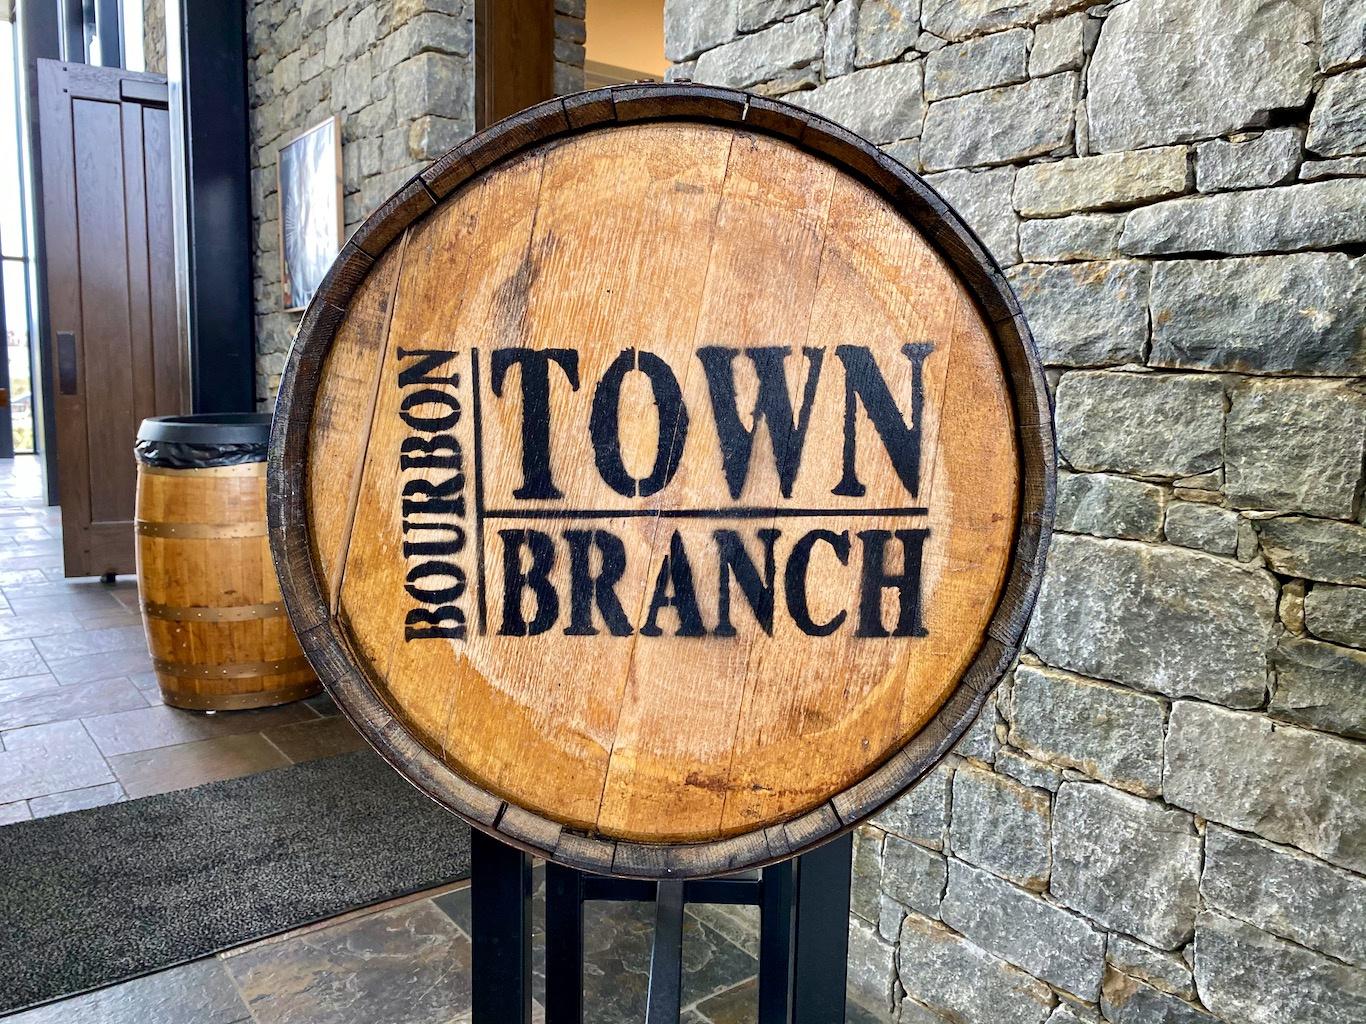 Lexington Brewing & Distilling Co (Town Branch Distillery)